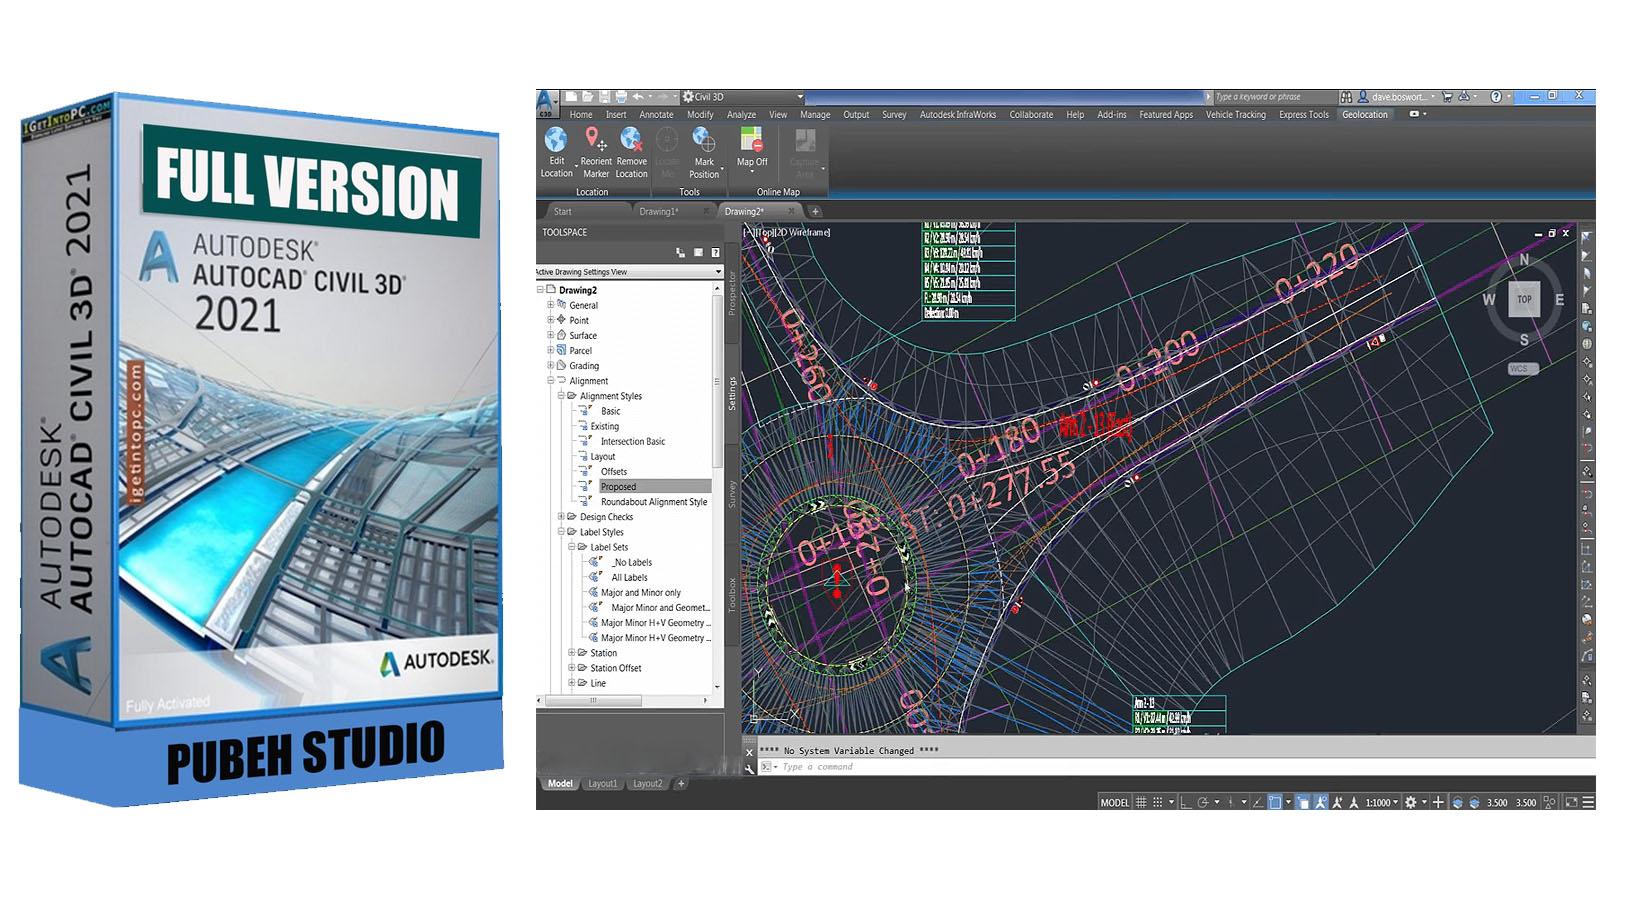 Cara Install Autocad Civil 3D 2021 Full Version Gratis